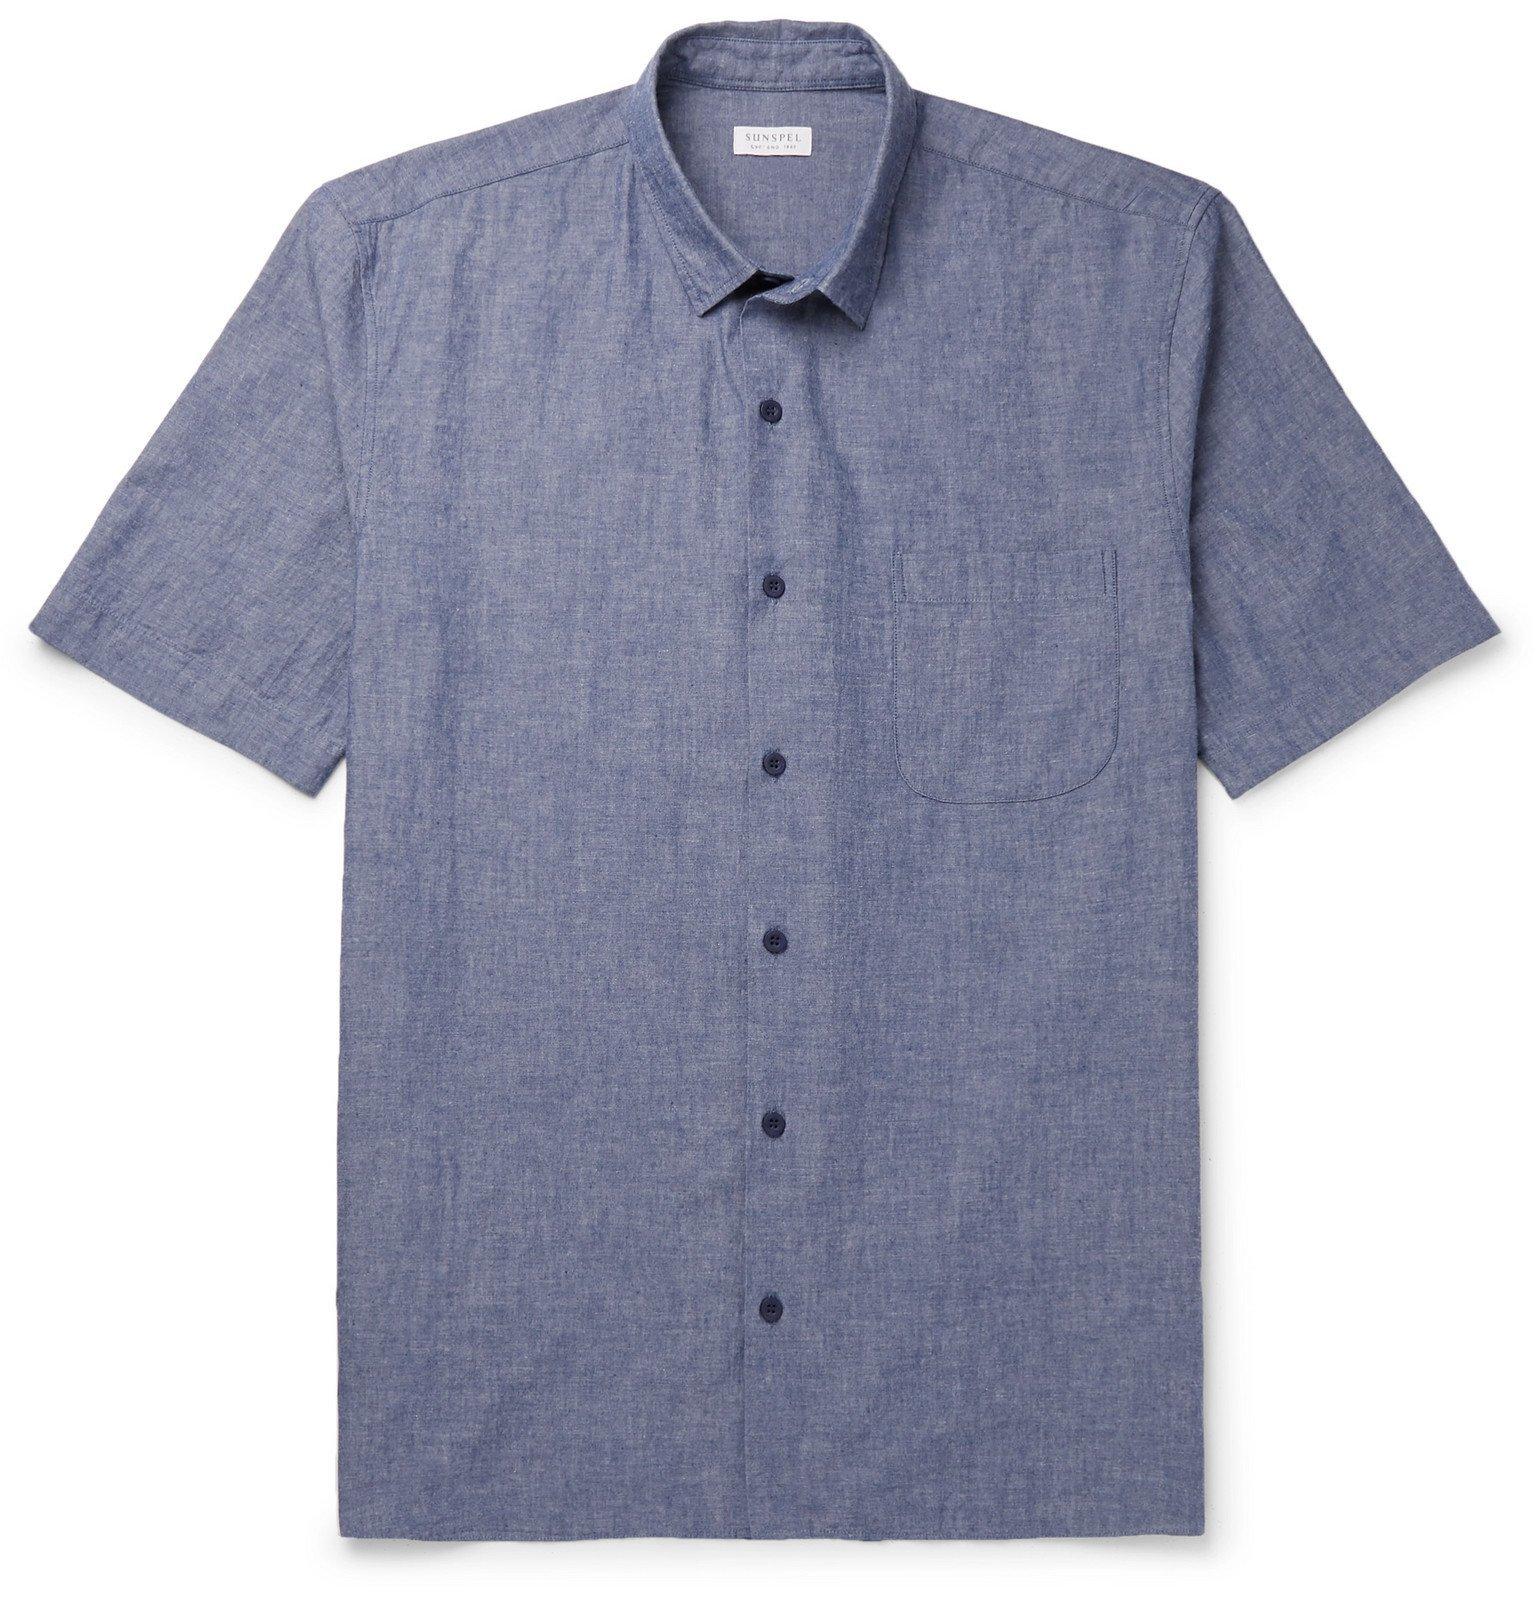 Sunspel - Mélange Selvedge Cotton-Chambray Shirt - Blue